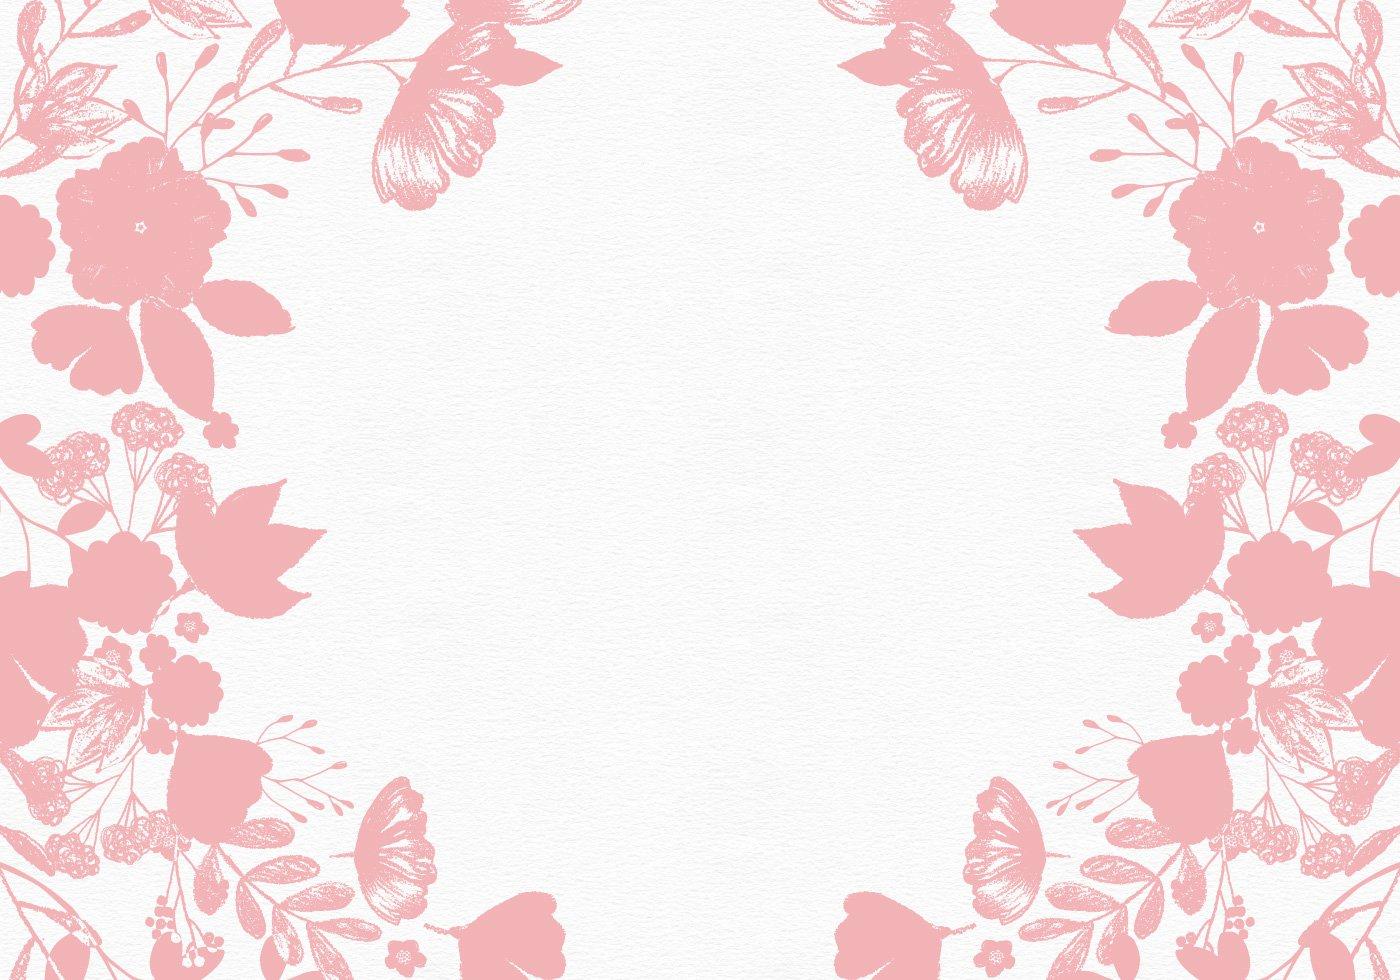 Background Vector Floral Spring Wallpaper Backgrounds For